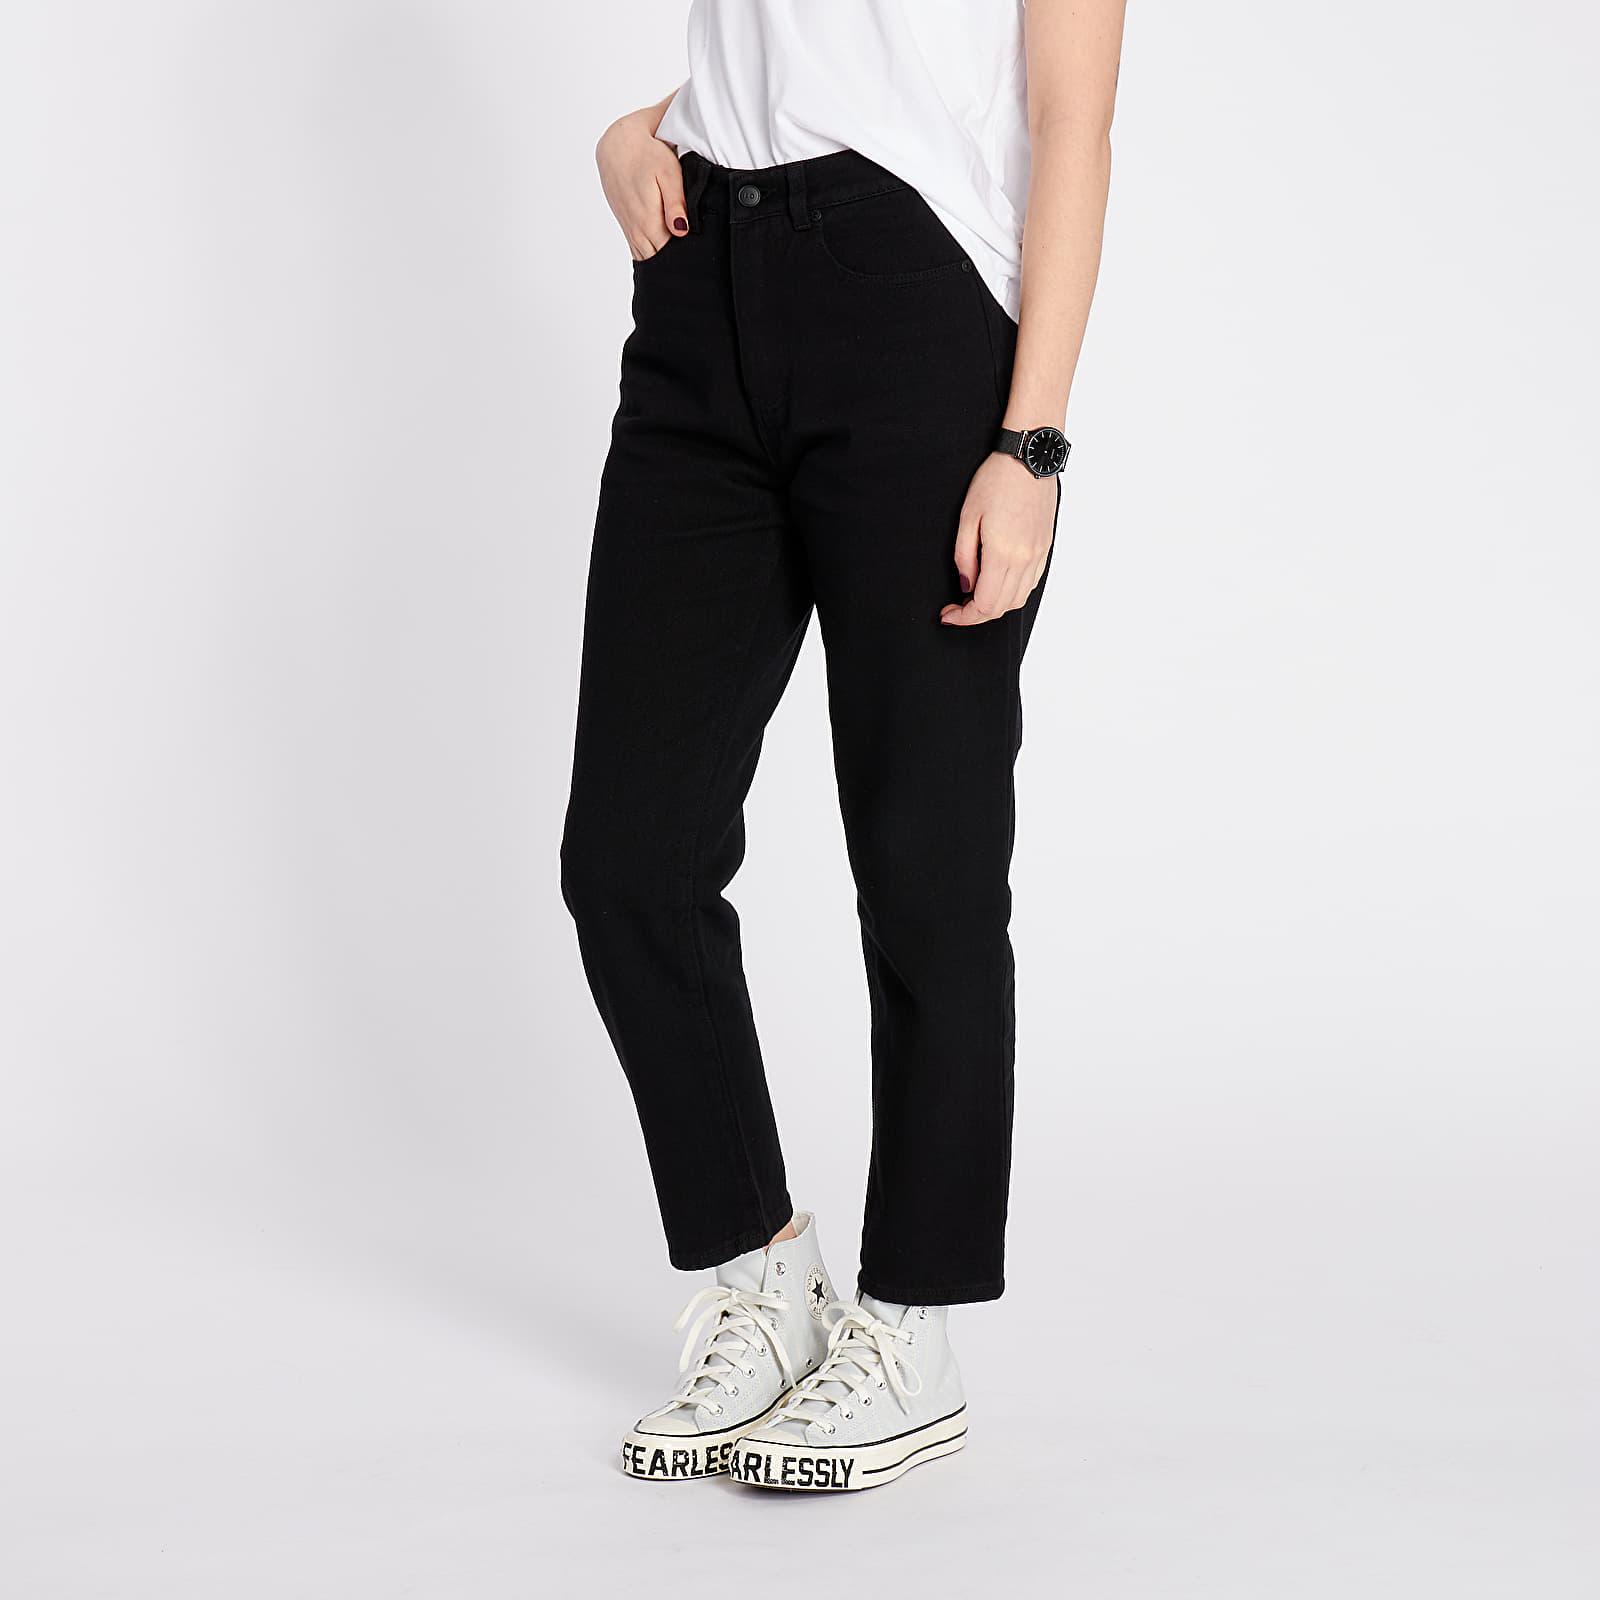 Lazy OAF Mom Jeans